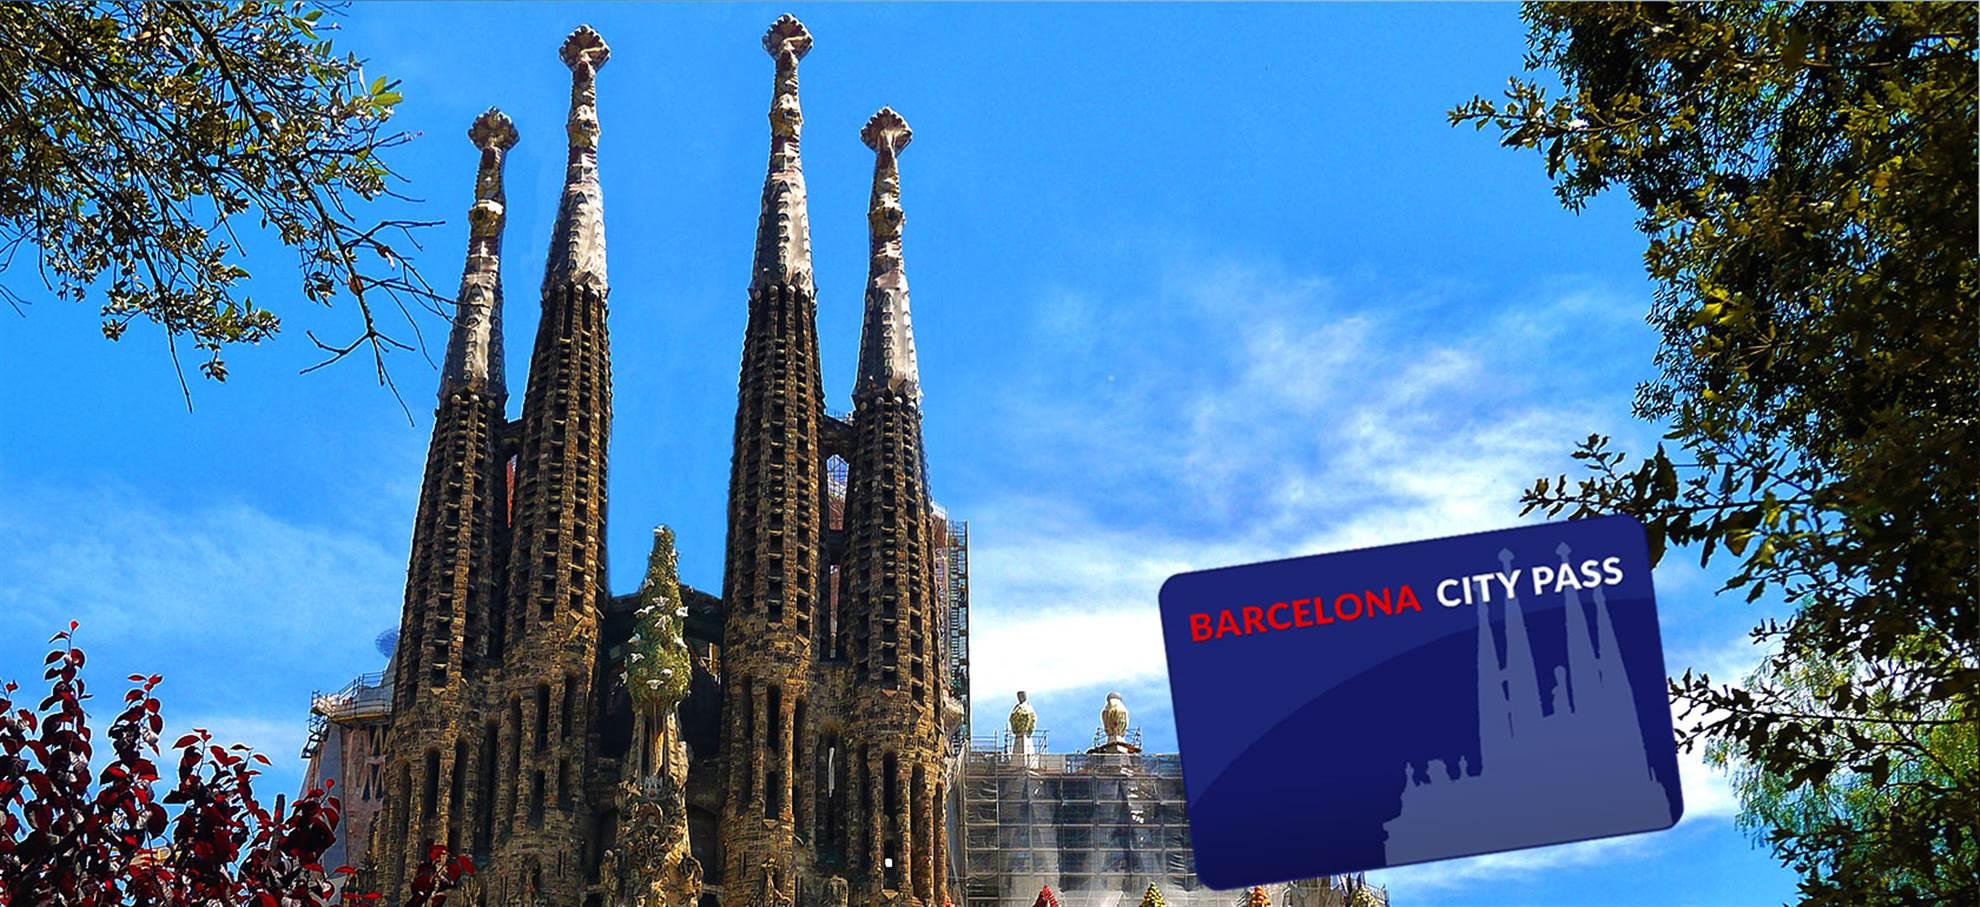 Barcelona City Pass (Incl. Sagrada Familia)